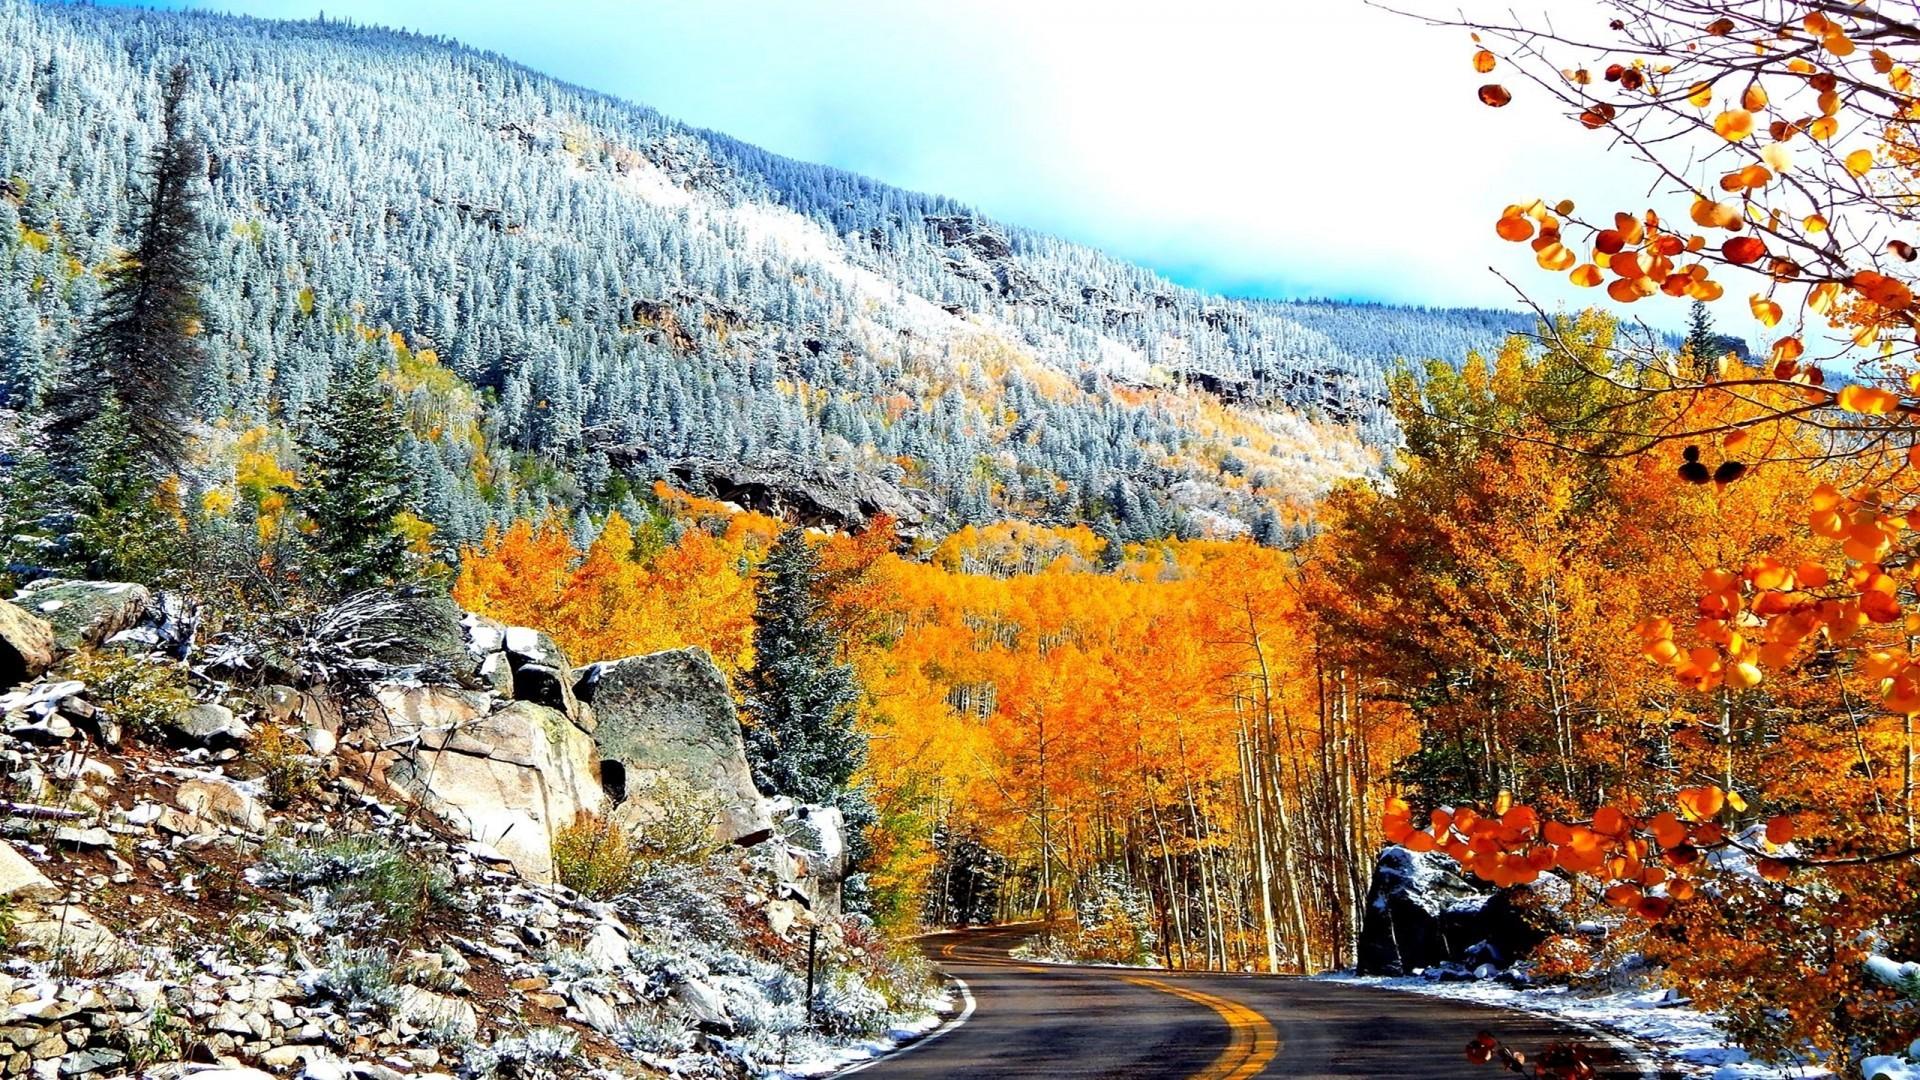 Fall Autumn Hd Wallpaper 1920x1080 Free Aspen Tree Wallpaper 54 Images